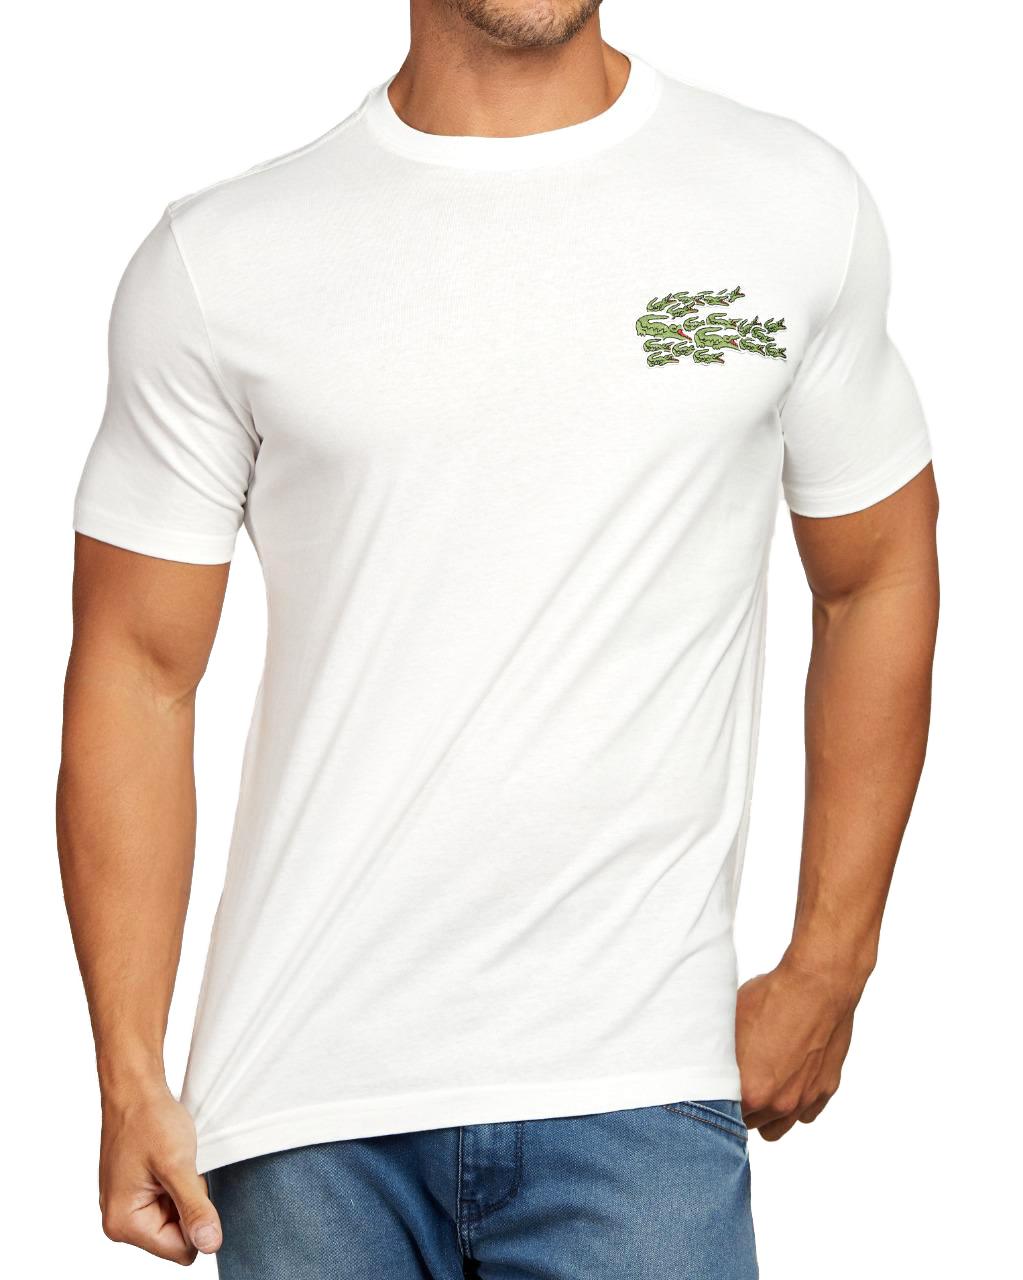 Camiseta Lacoste Live Masculina Croc Patch Classic Cotton Branco